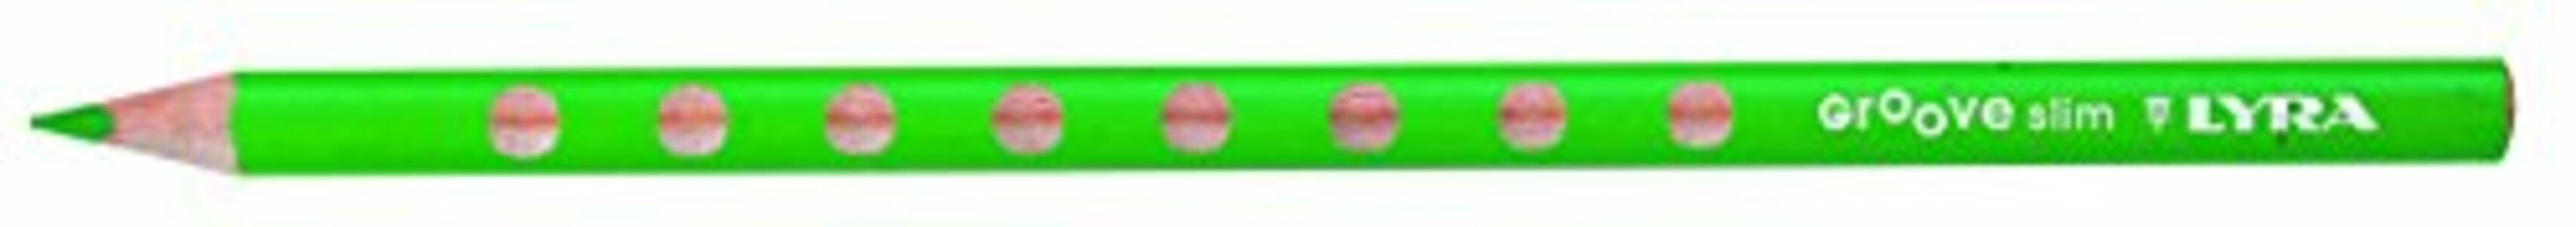 Pastelli Lyra Groove Slim. Scatola 12 matite colorate assortite + temperino - 2